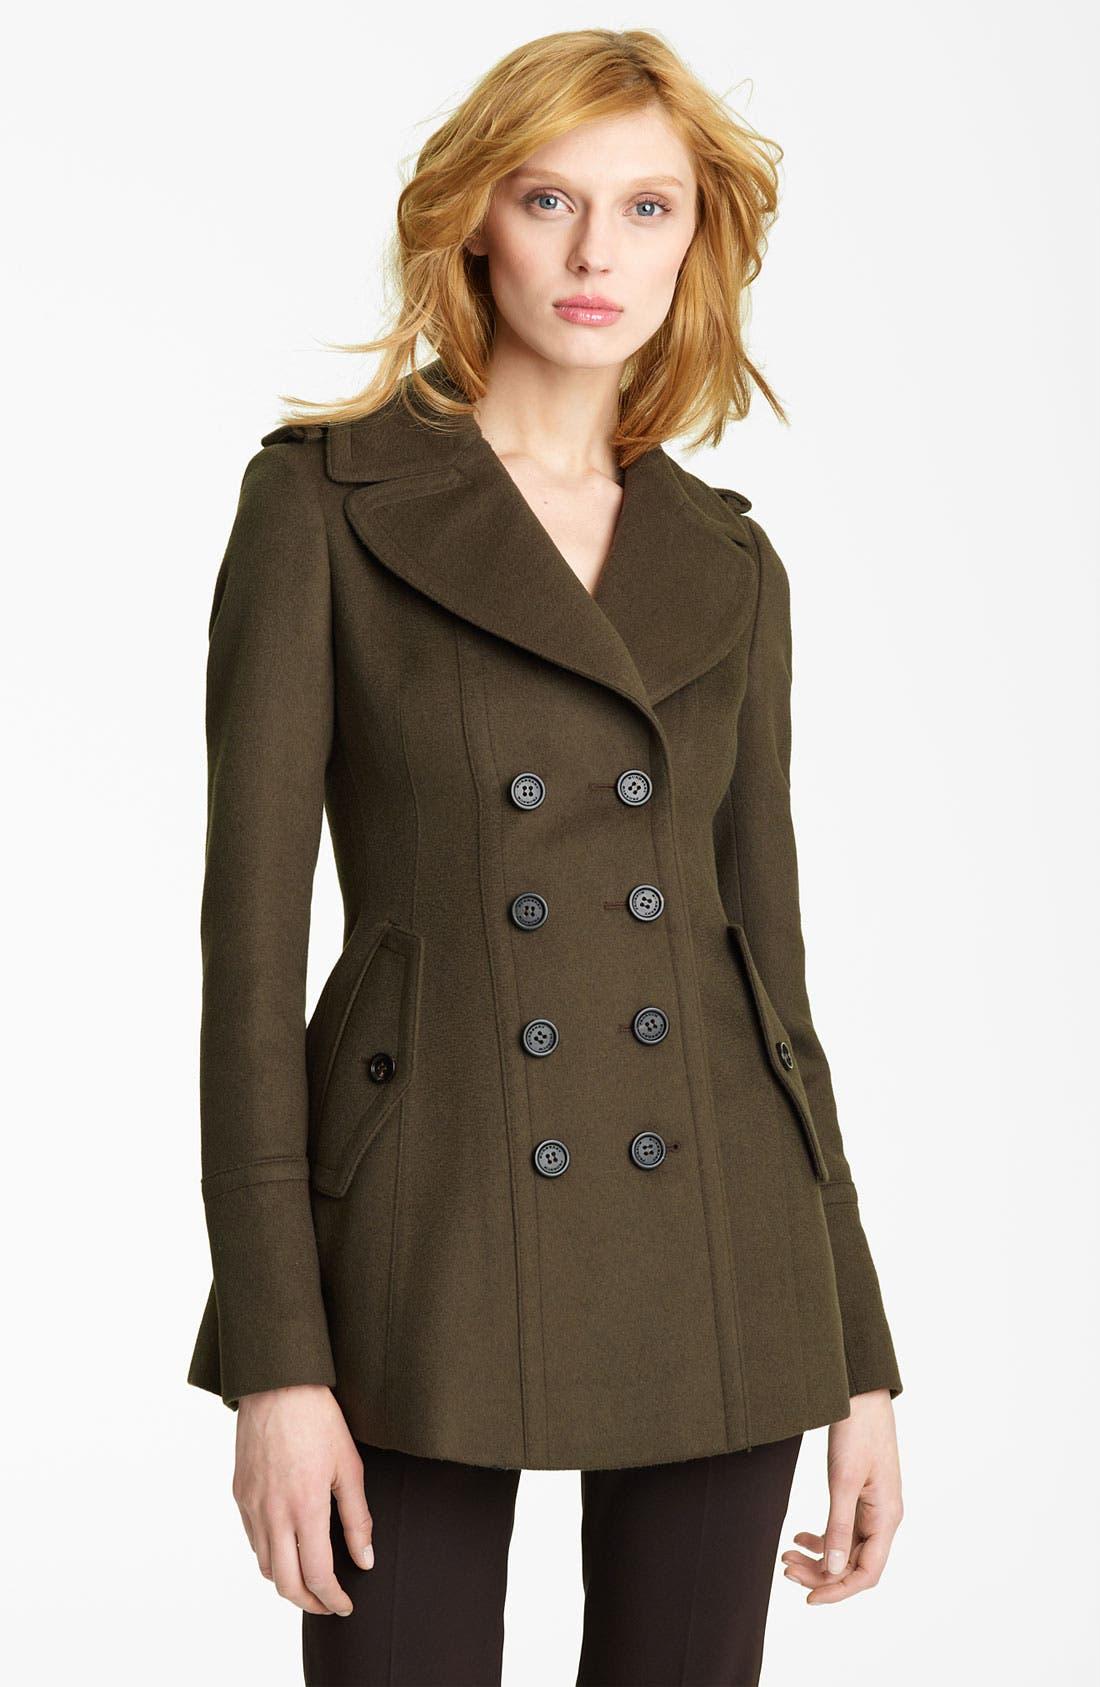 Alternate Image 1 Selected - Burberry Prorsum Wool & Cashmere Coat